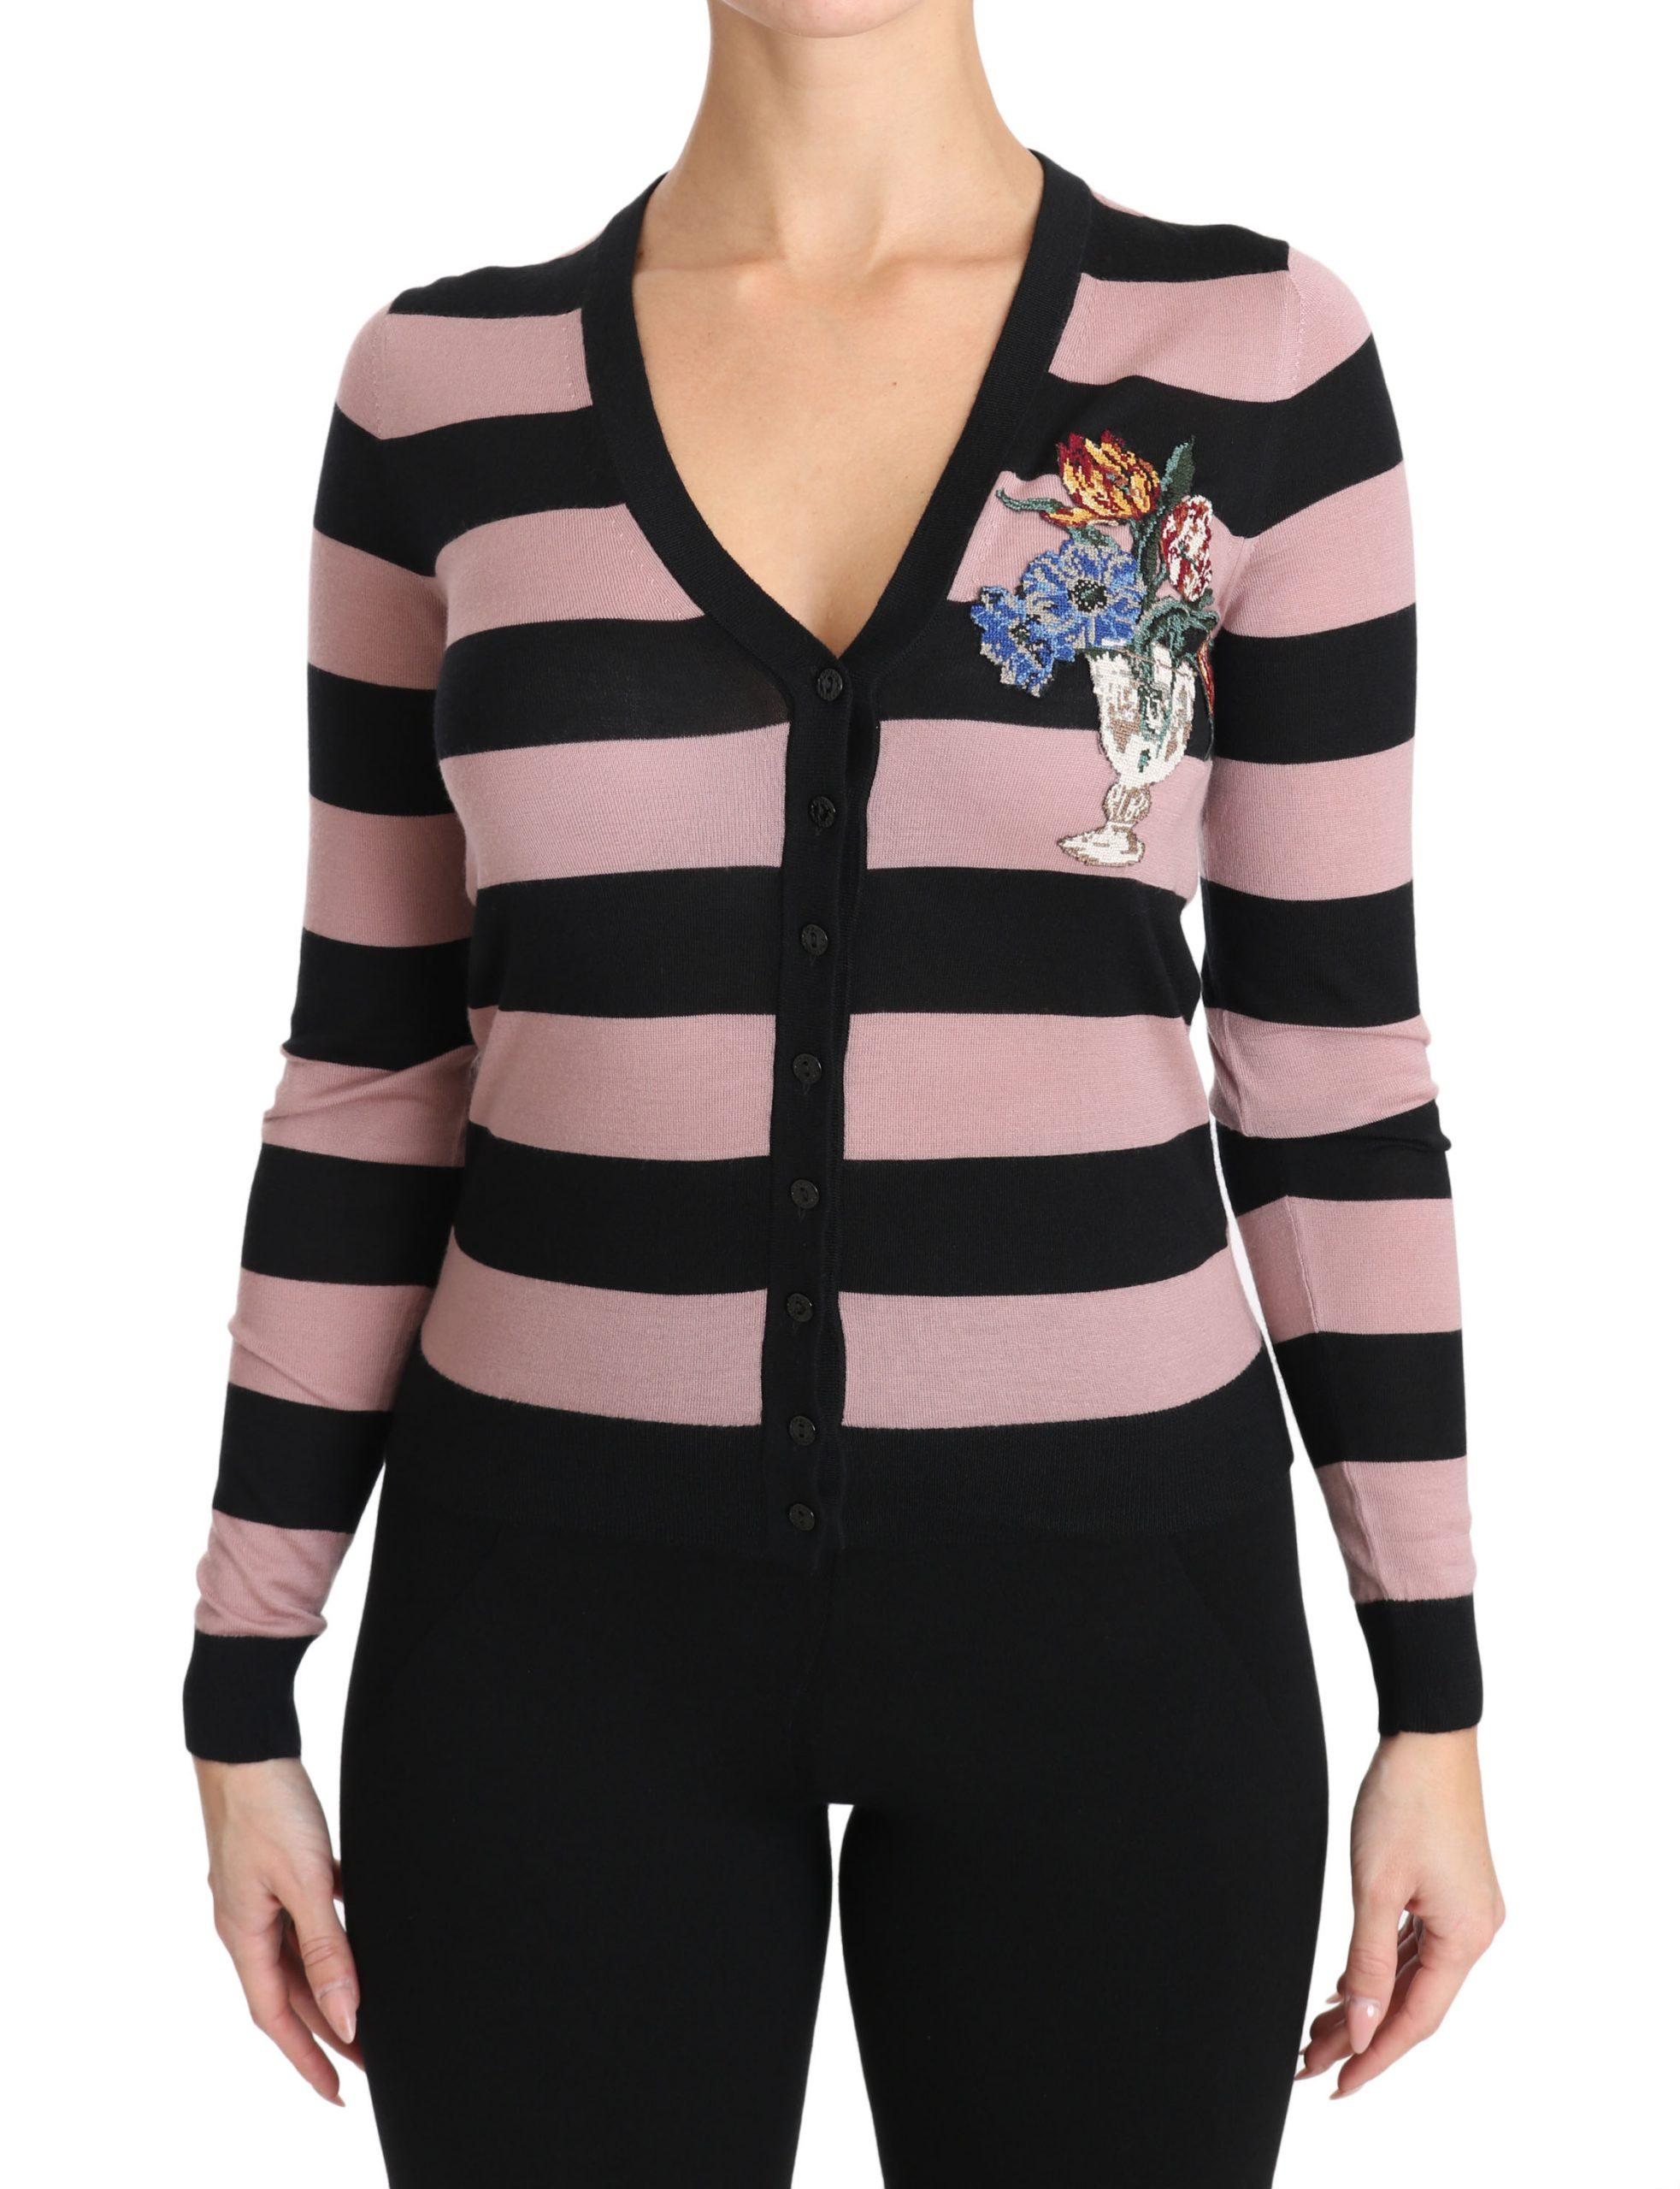 Dolce & Gabbana Women's Floral Cashmere Cardigan Grey TSH3130 - IT36 | XS